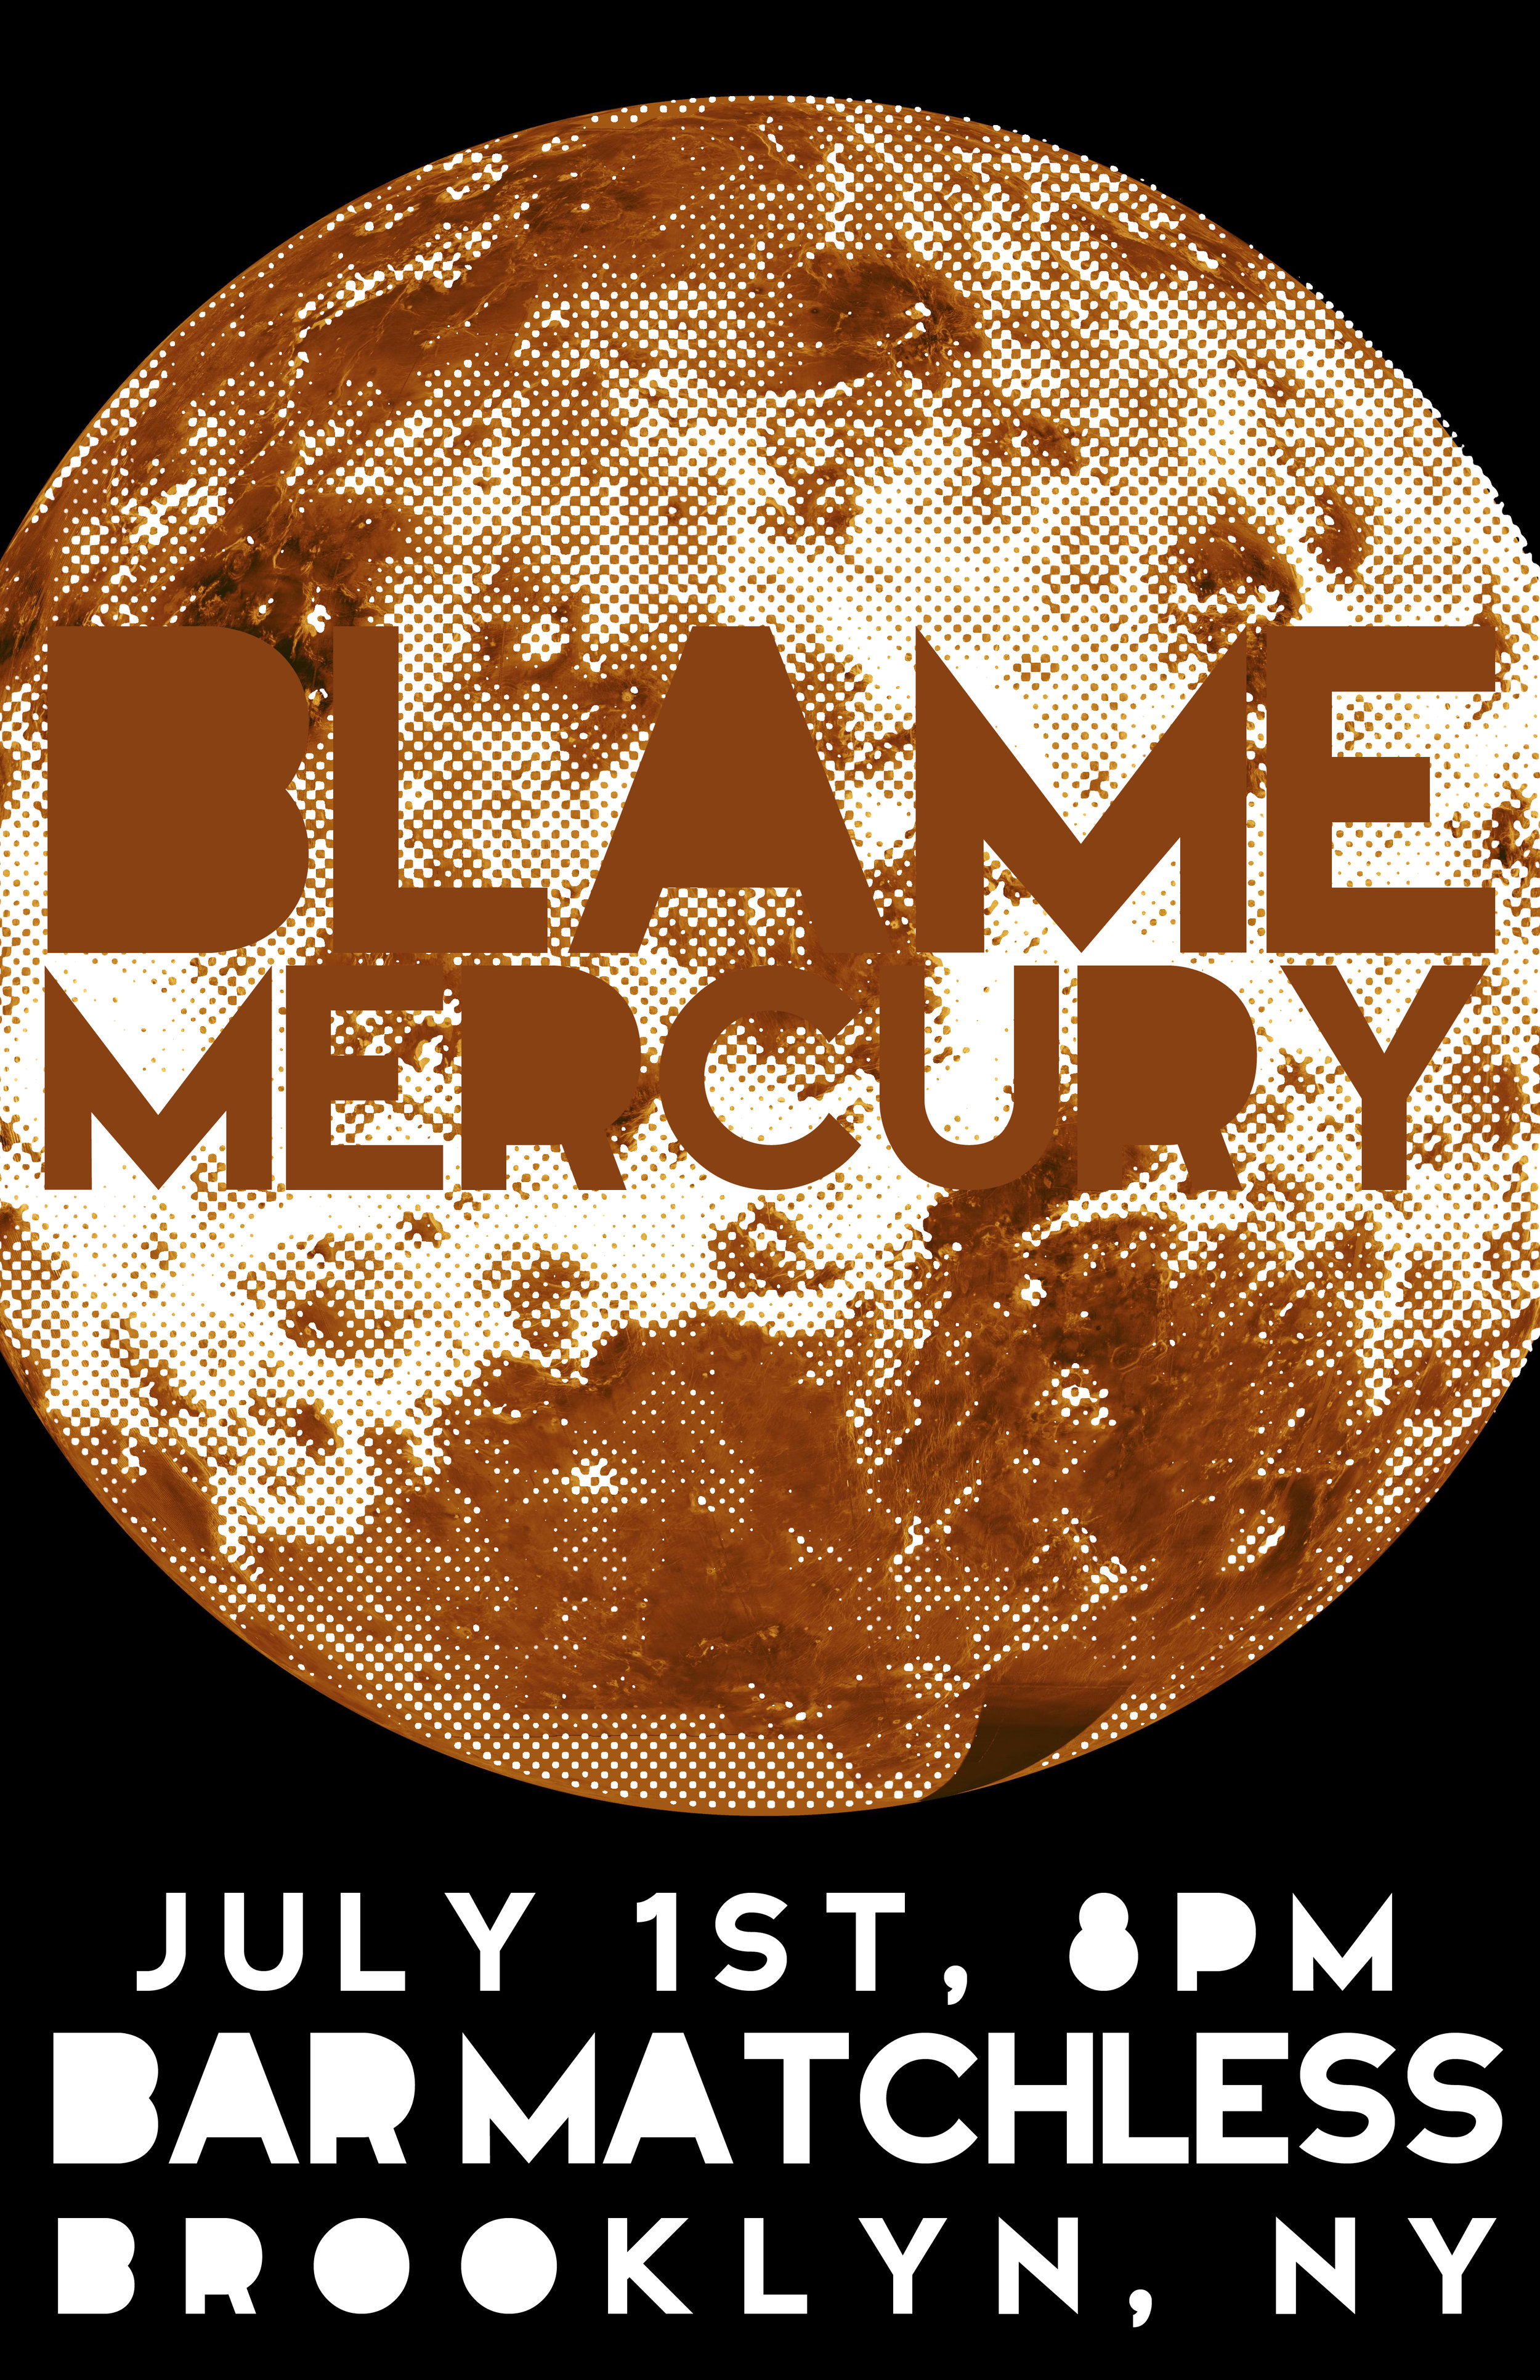 16-0701 Blame Mercury at Matchless.jpg